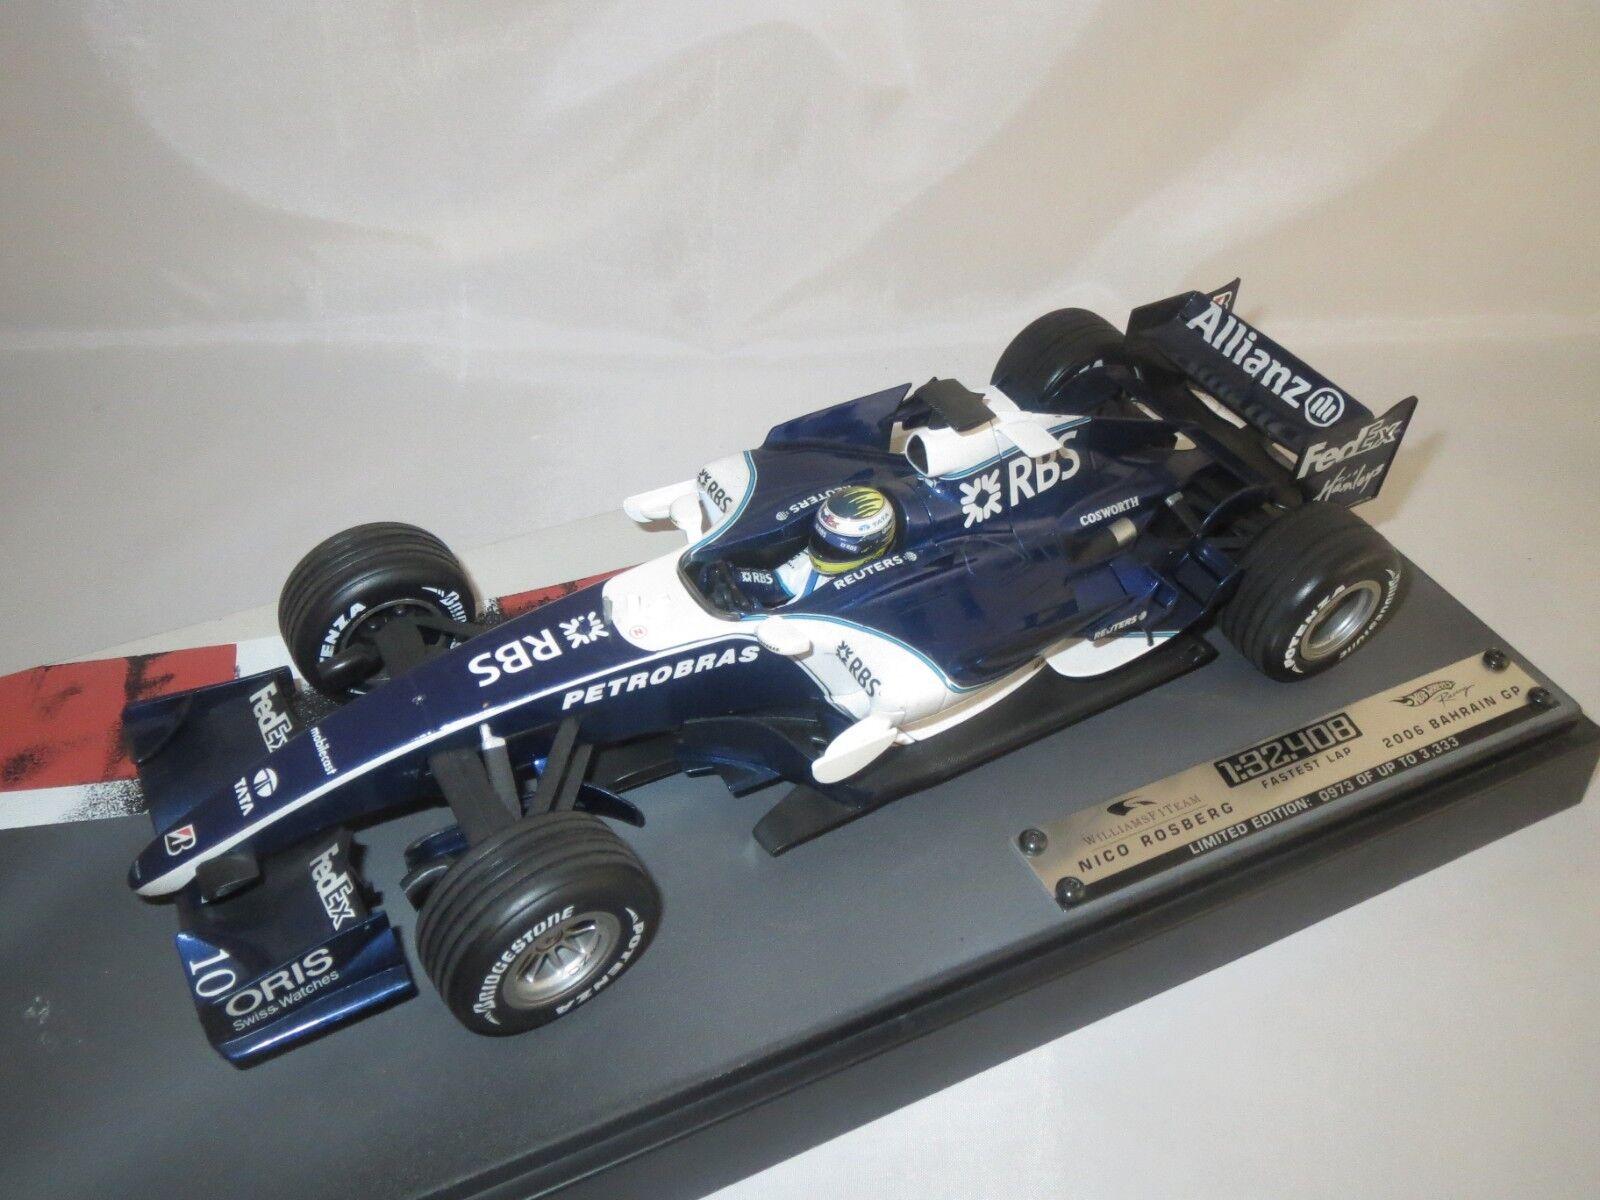 Mattel j2988  Nico Rosberg  (Bahréin gp 2006) 1 18 embalaje original (f16)